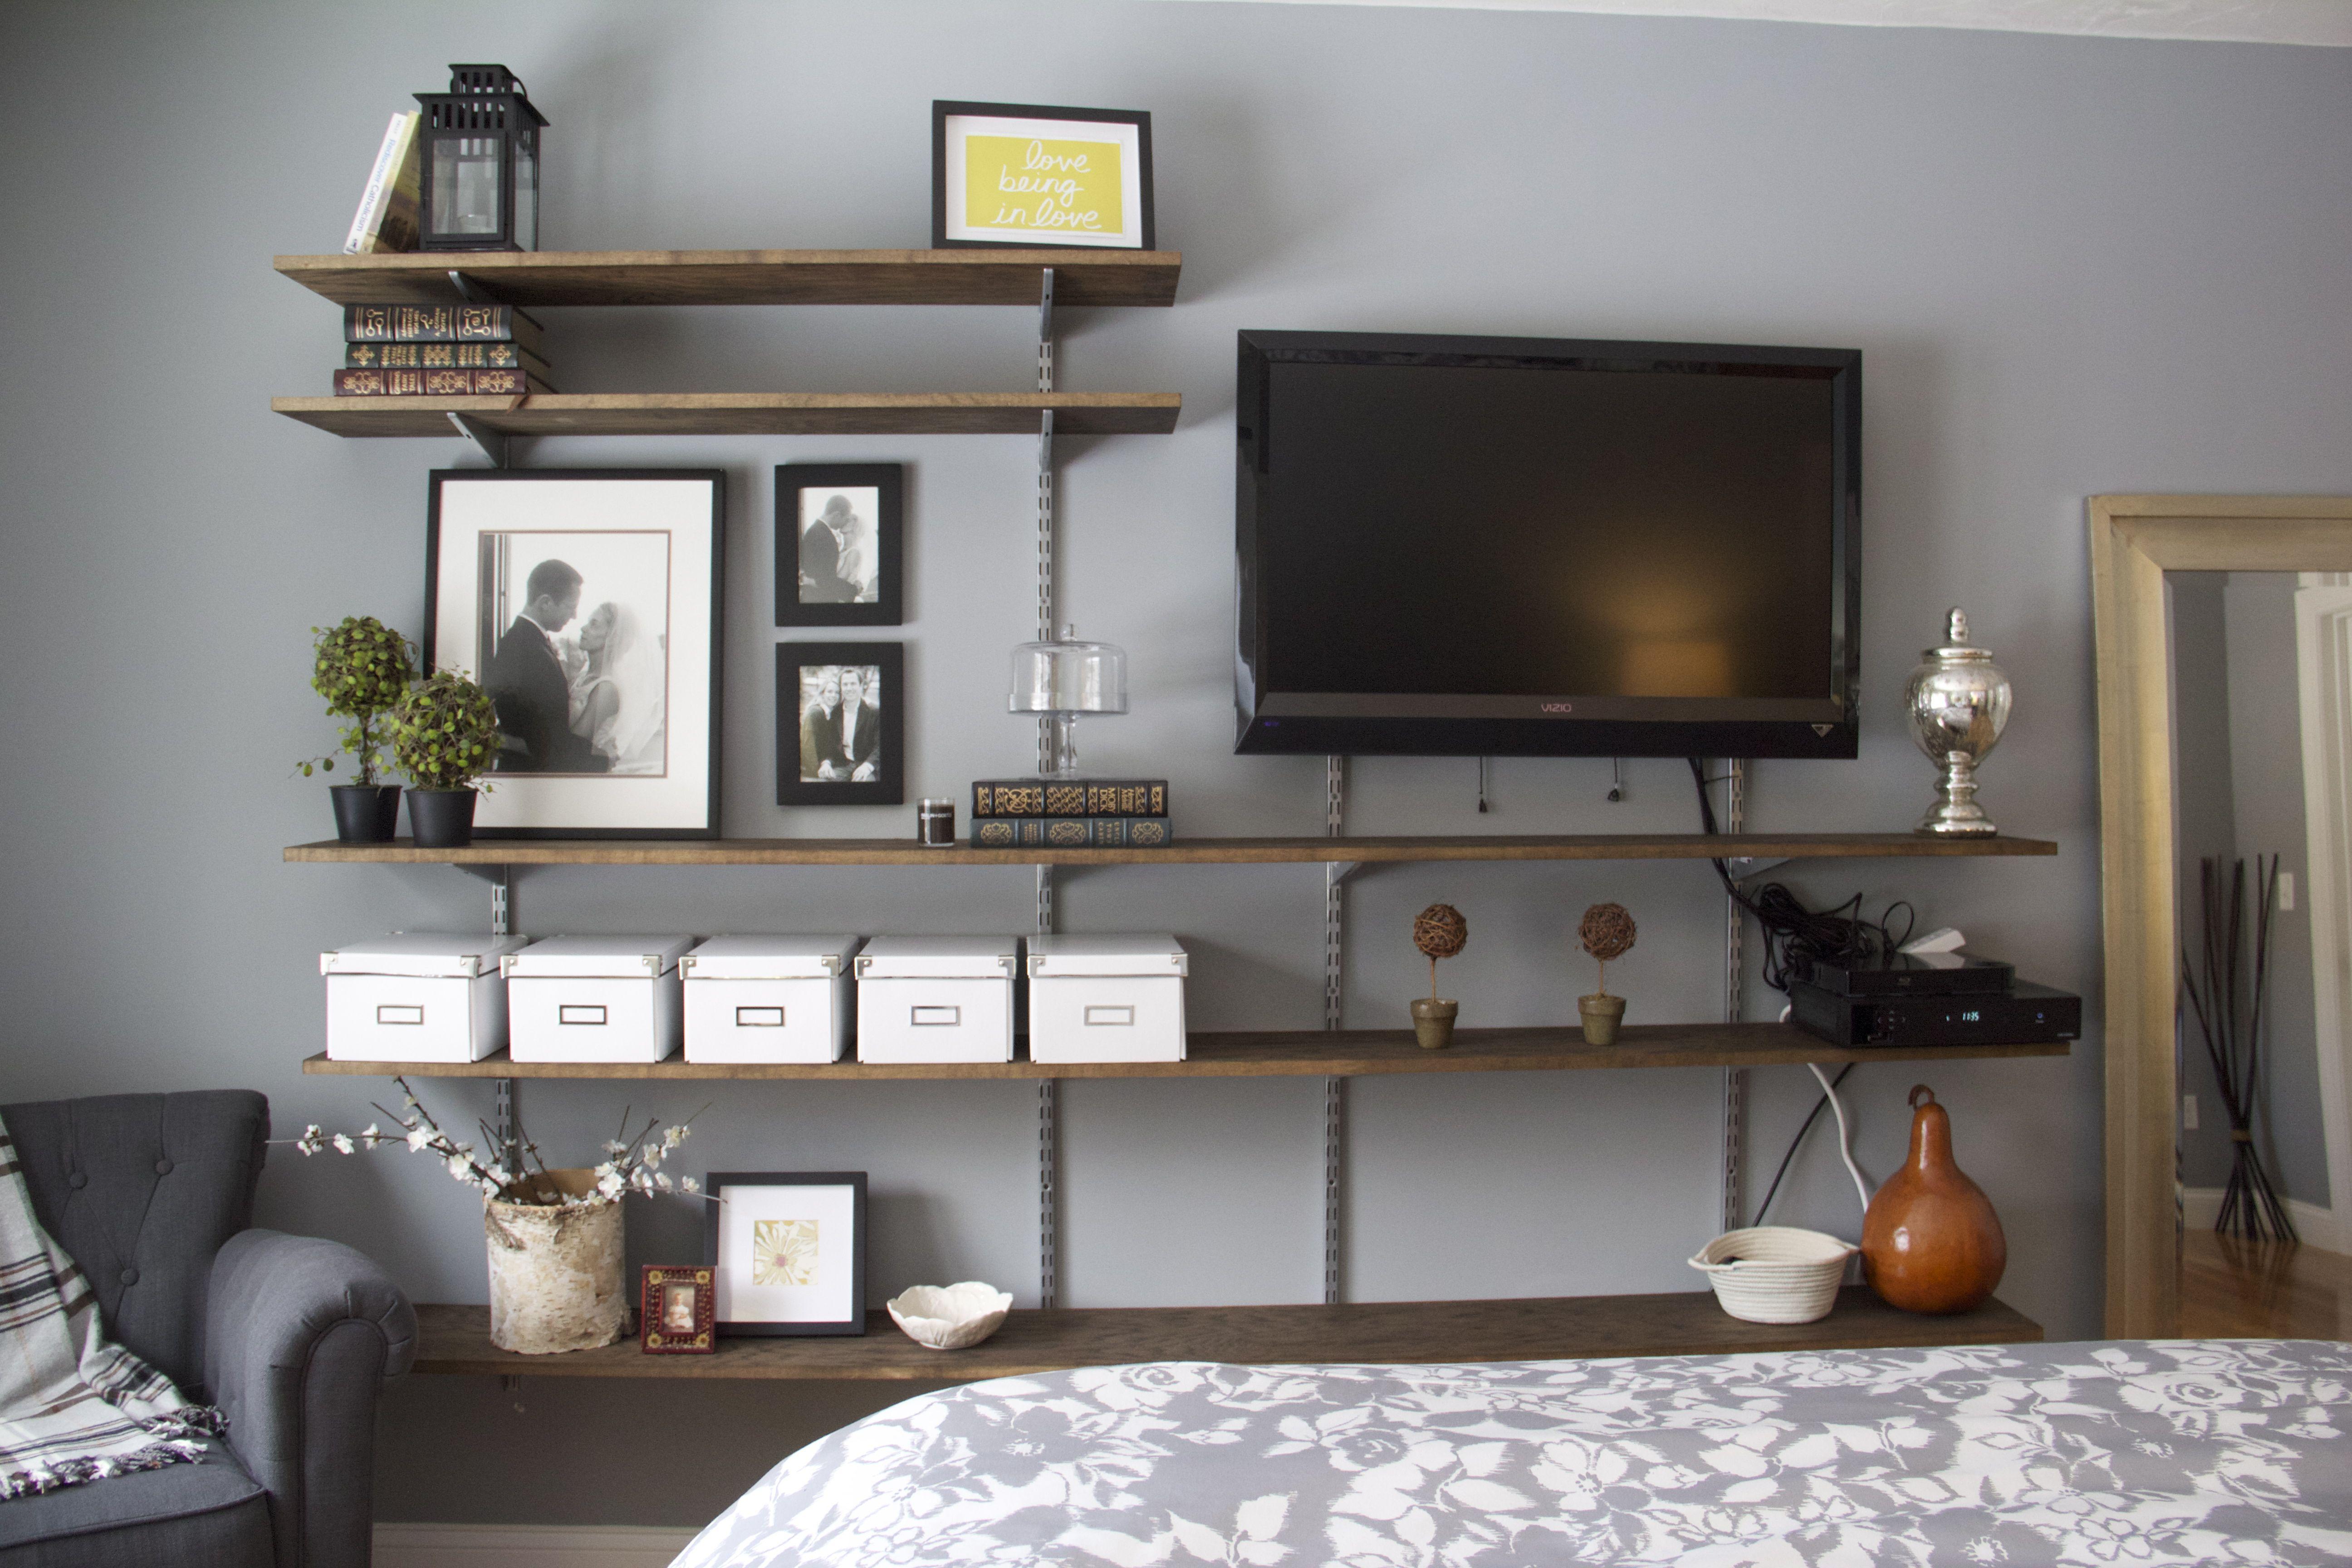 Master bedroom entertainment centers  master bedroom TV wall  Home ideas  Pinterest  Bedroom tv Tv